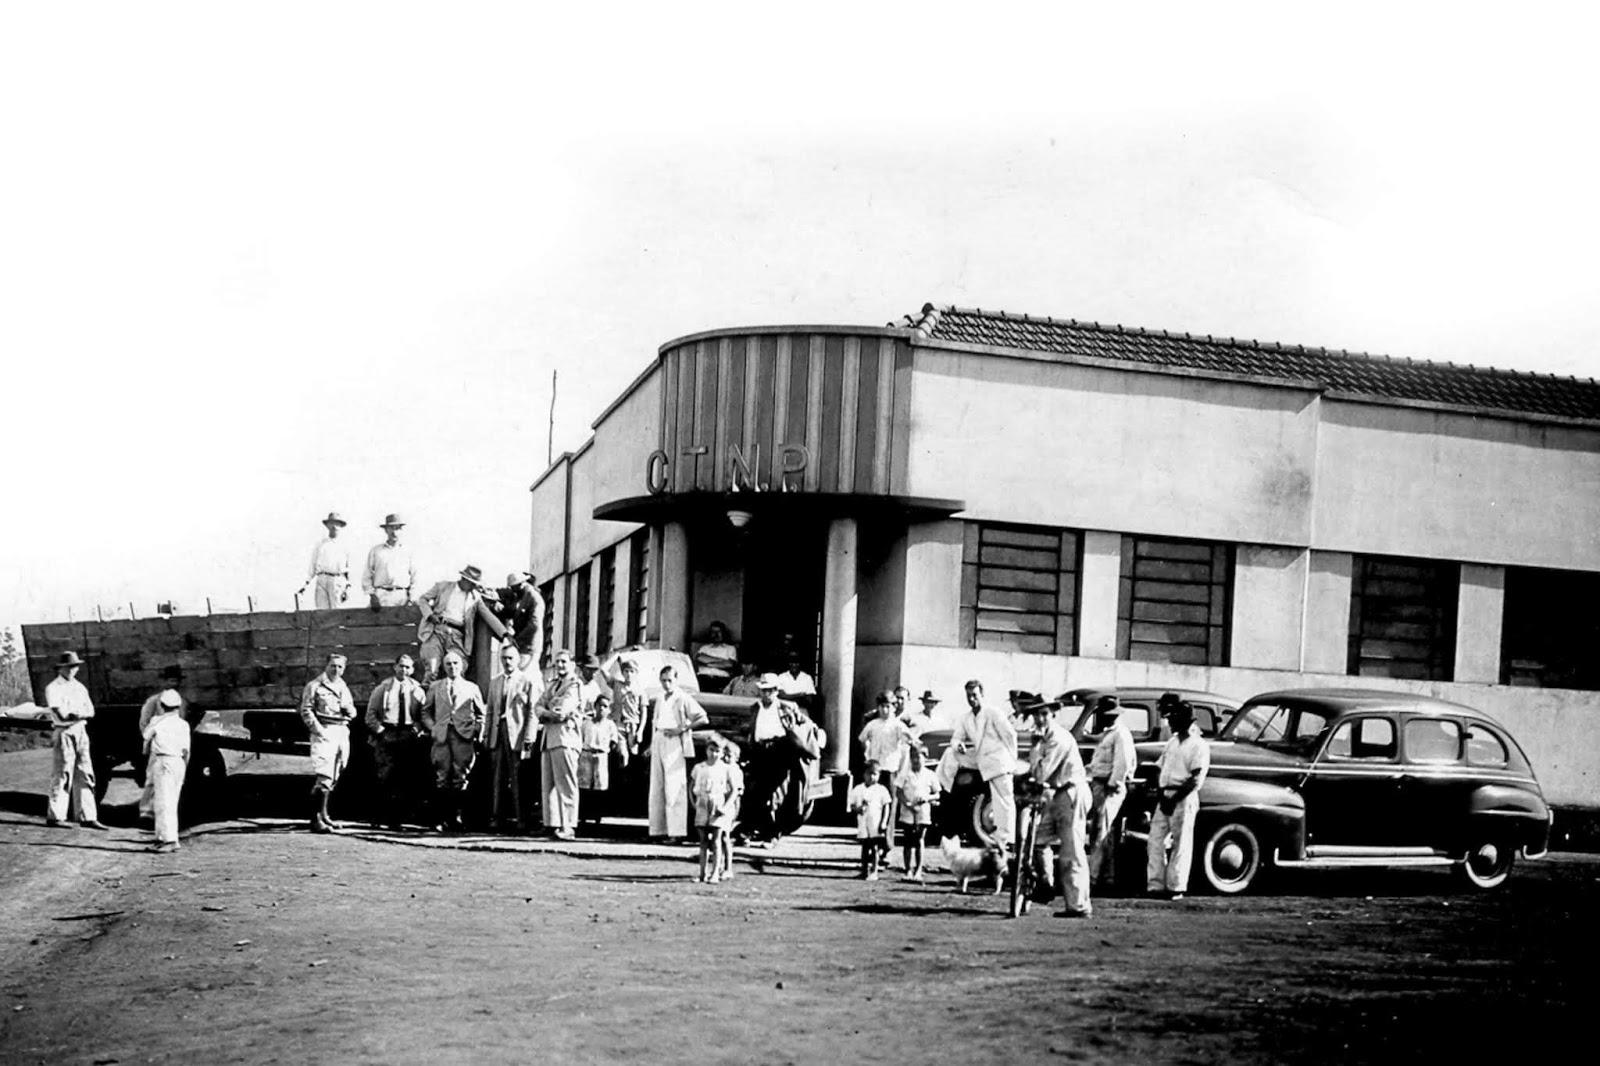 1ª sede da CTNP - Década de 1940